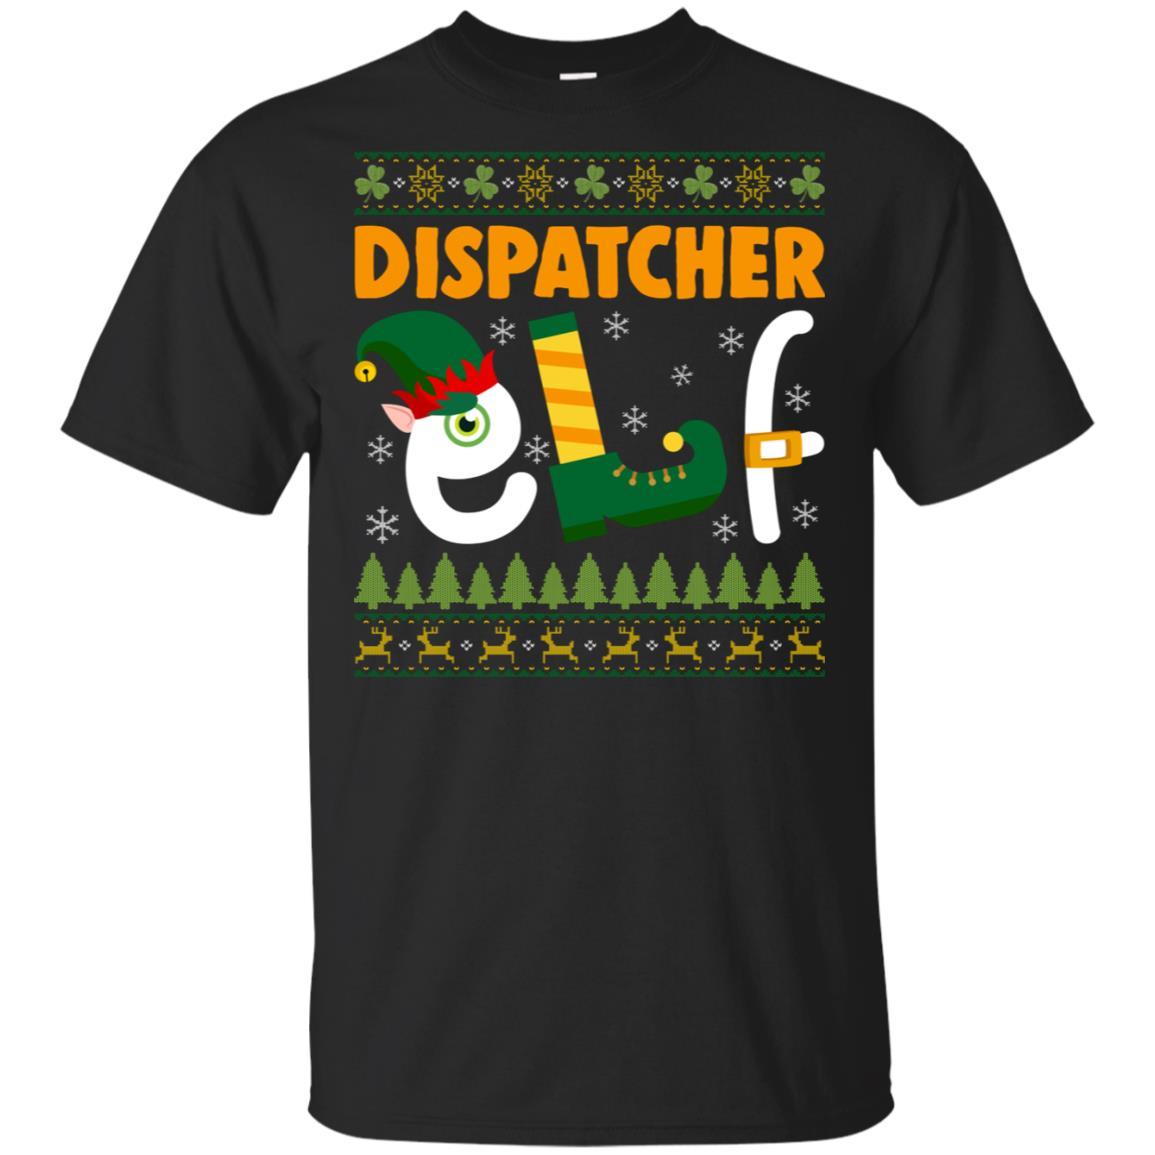 Dispatcher Elf Unisex Short Sleeve